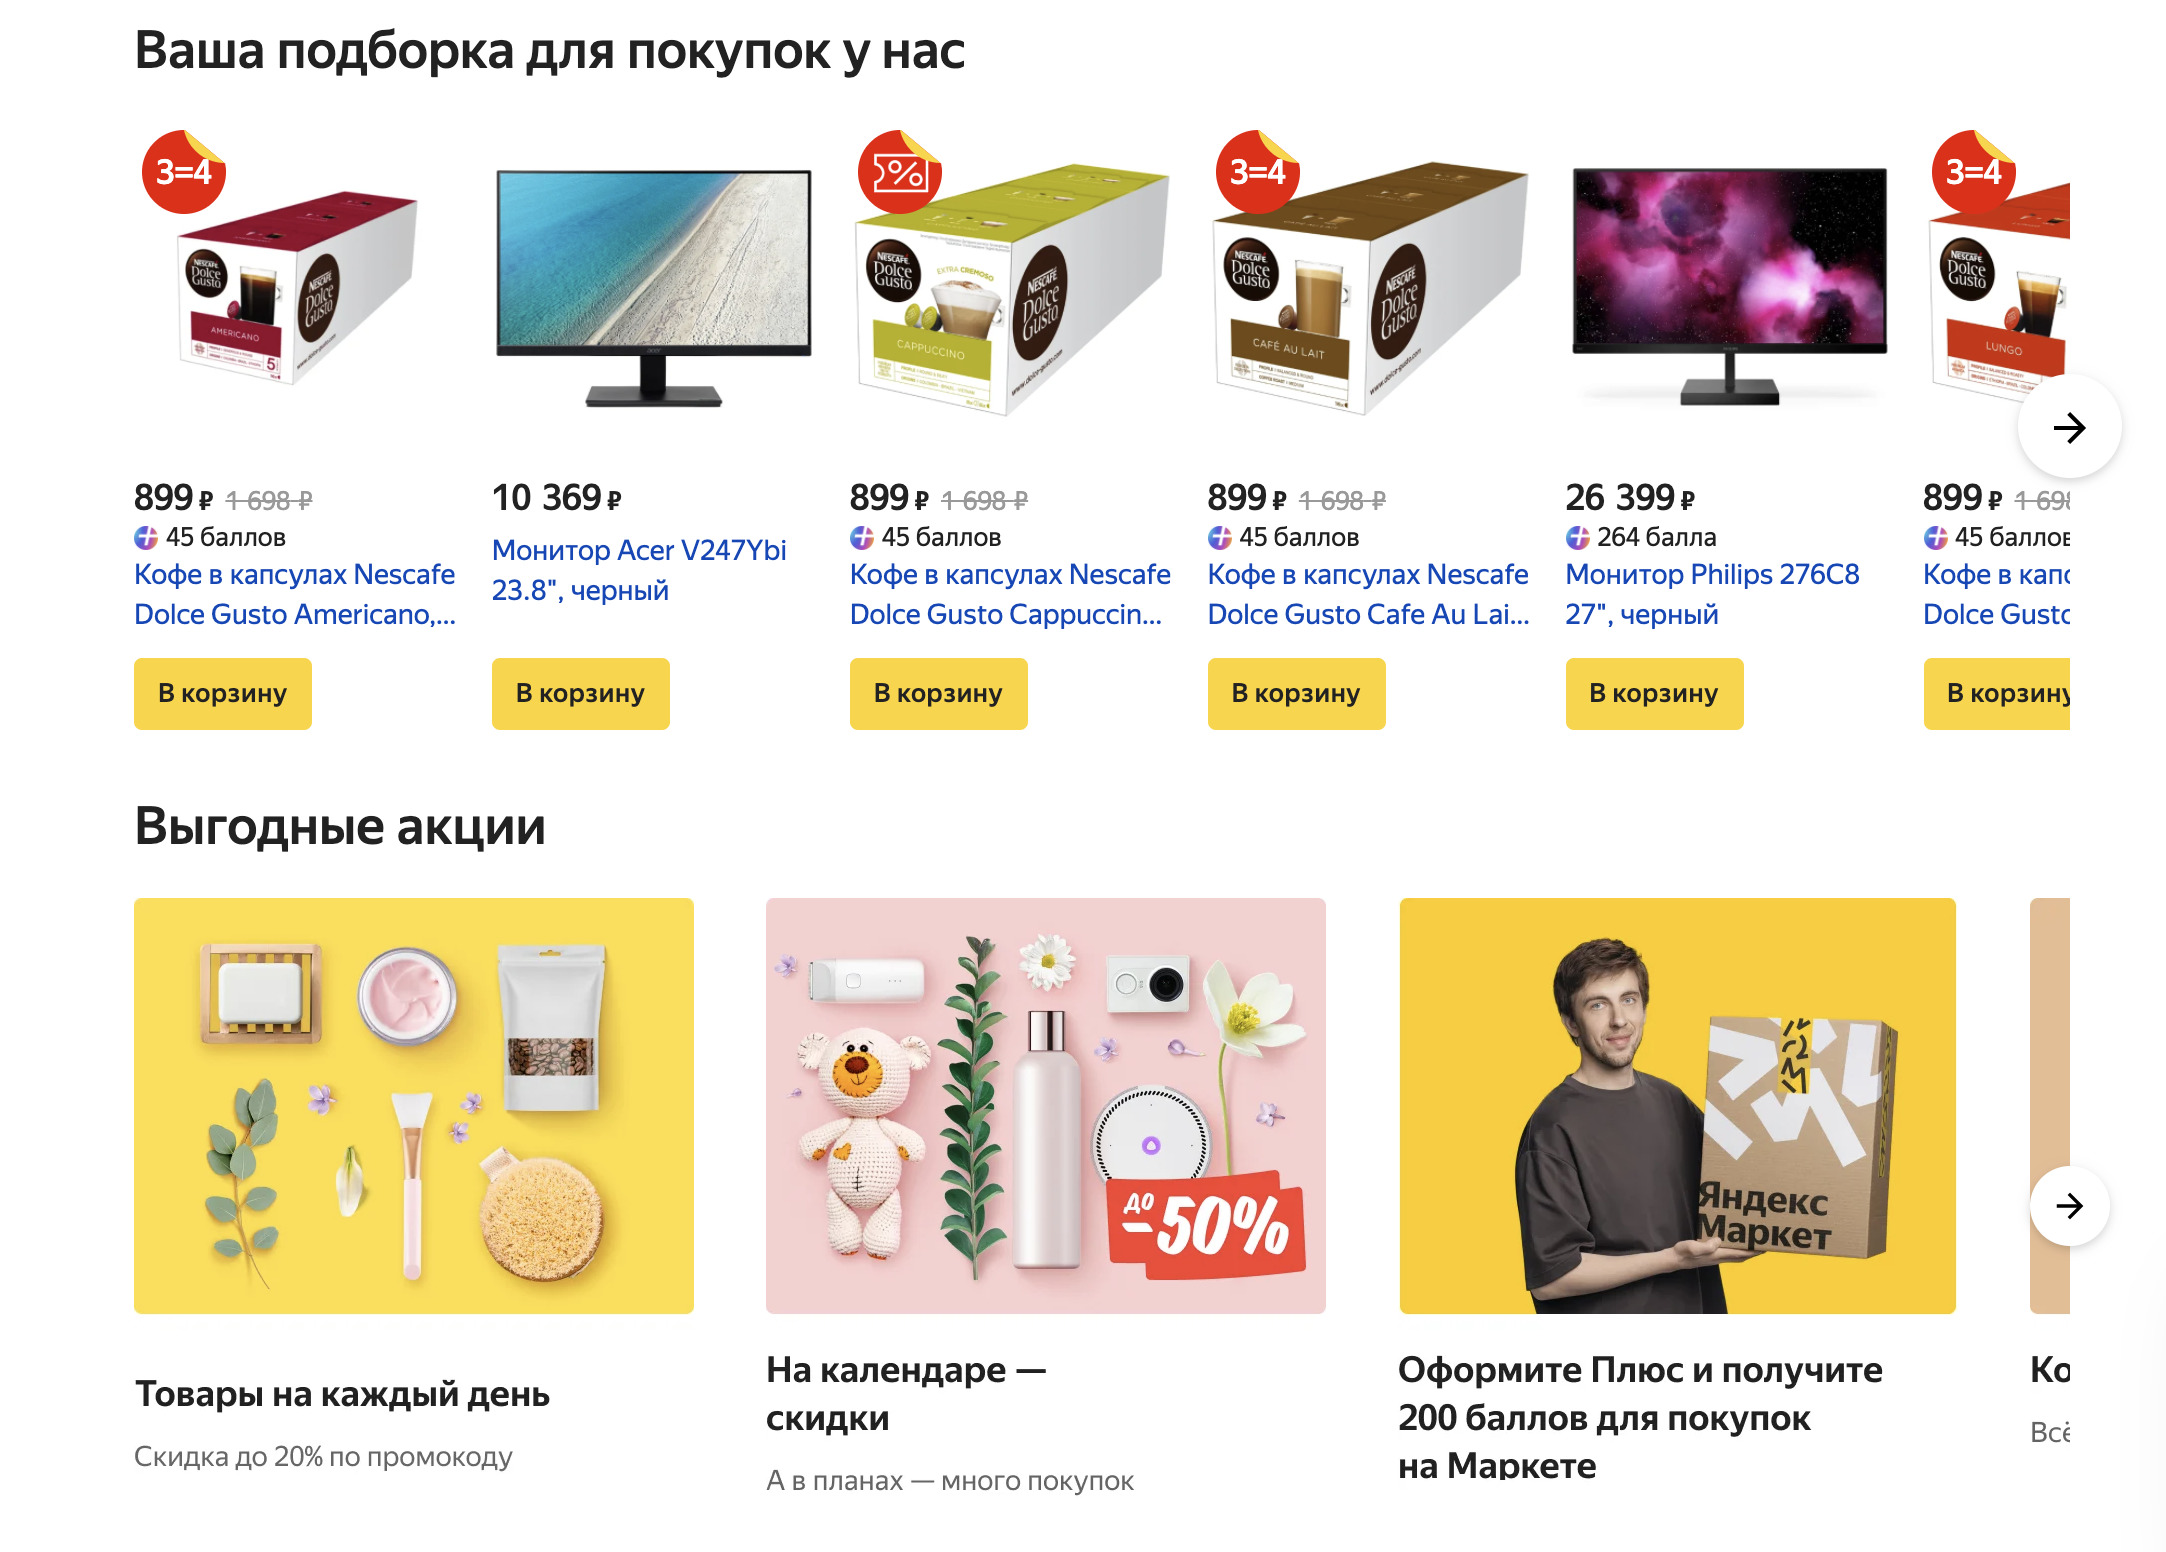 Доставка из Яндекс.Маркет в Сарапул, сроки, пункты выдачи, каталог